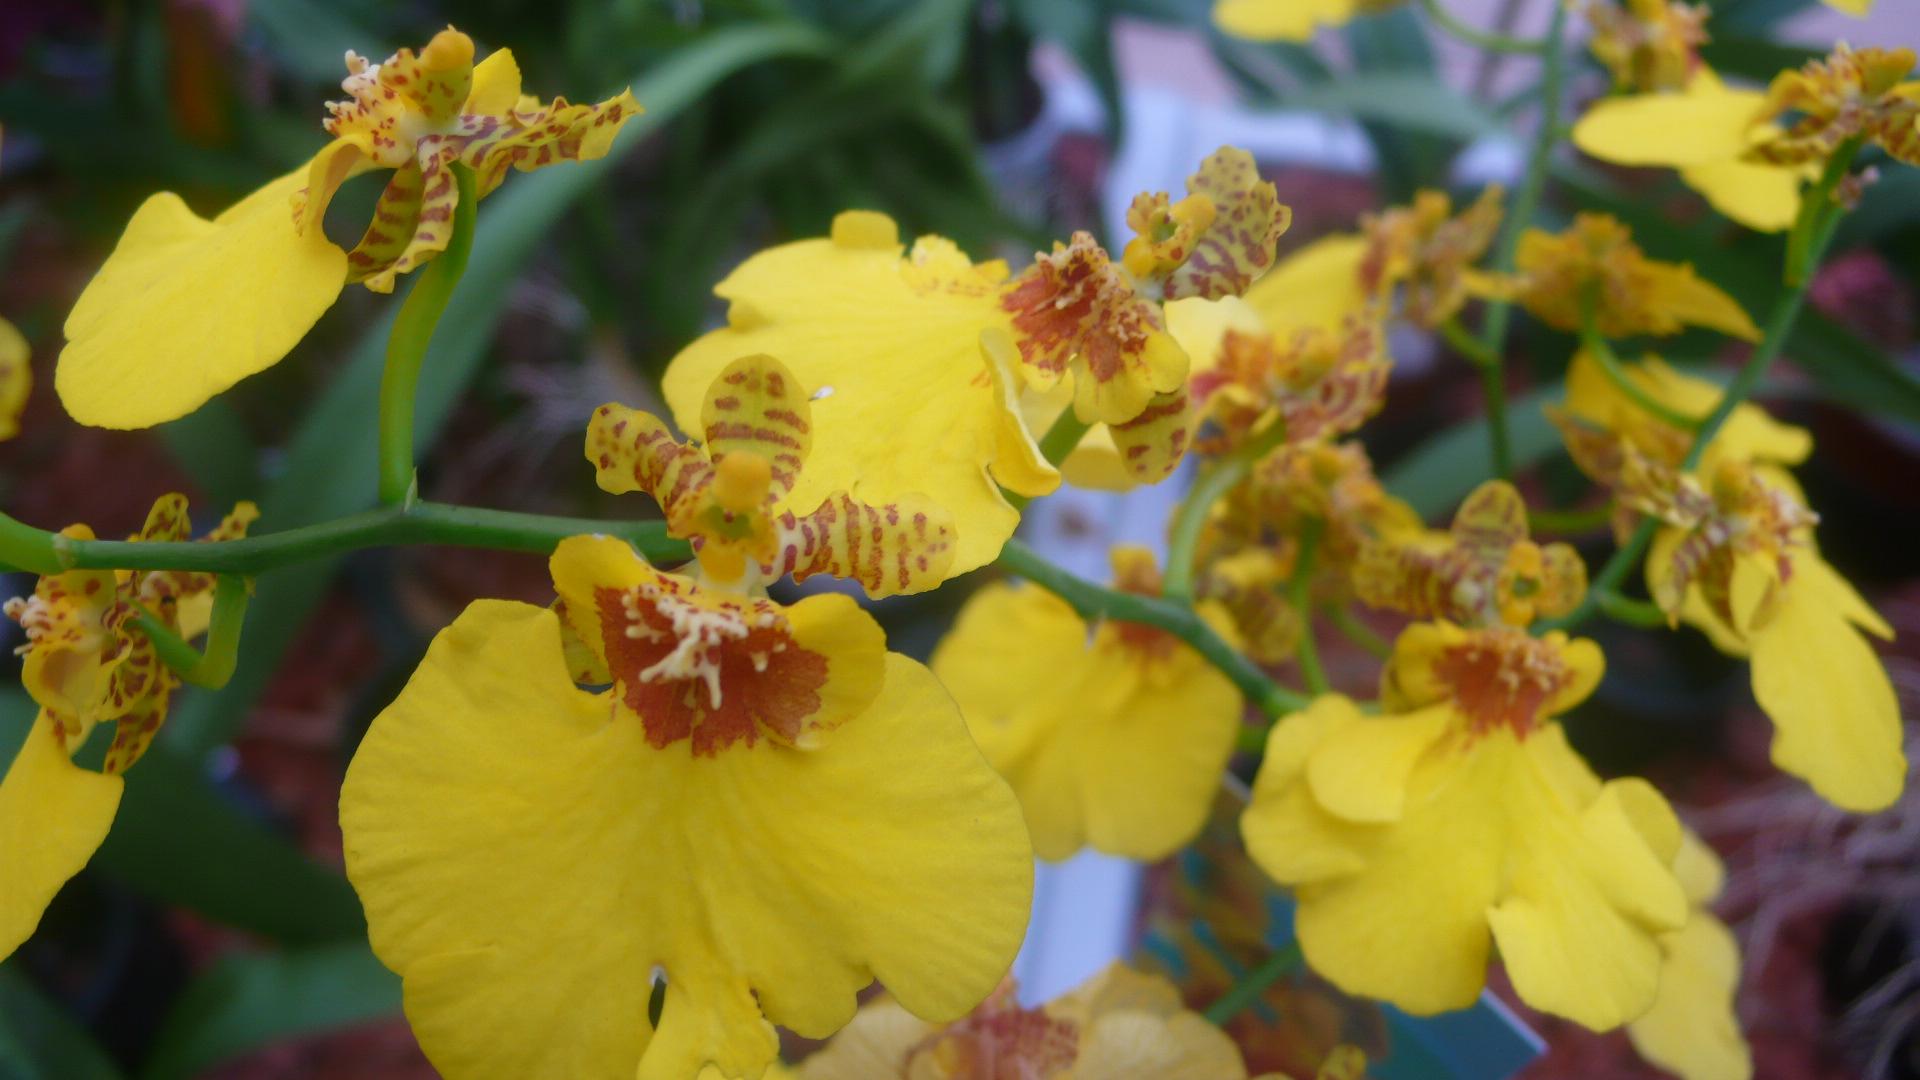 ein nettes radiogespr ch ber orchideen heike boomgaarden. Black Bedroom Furniture Sets. Home Design Ideas